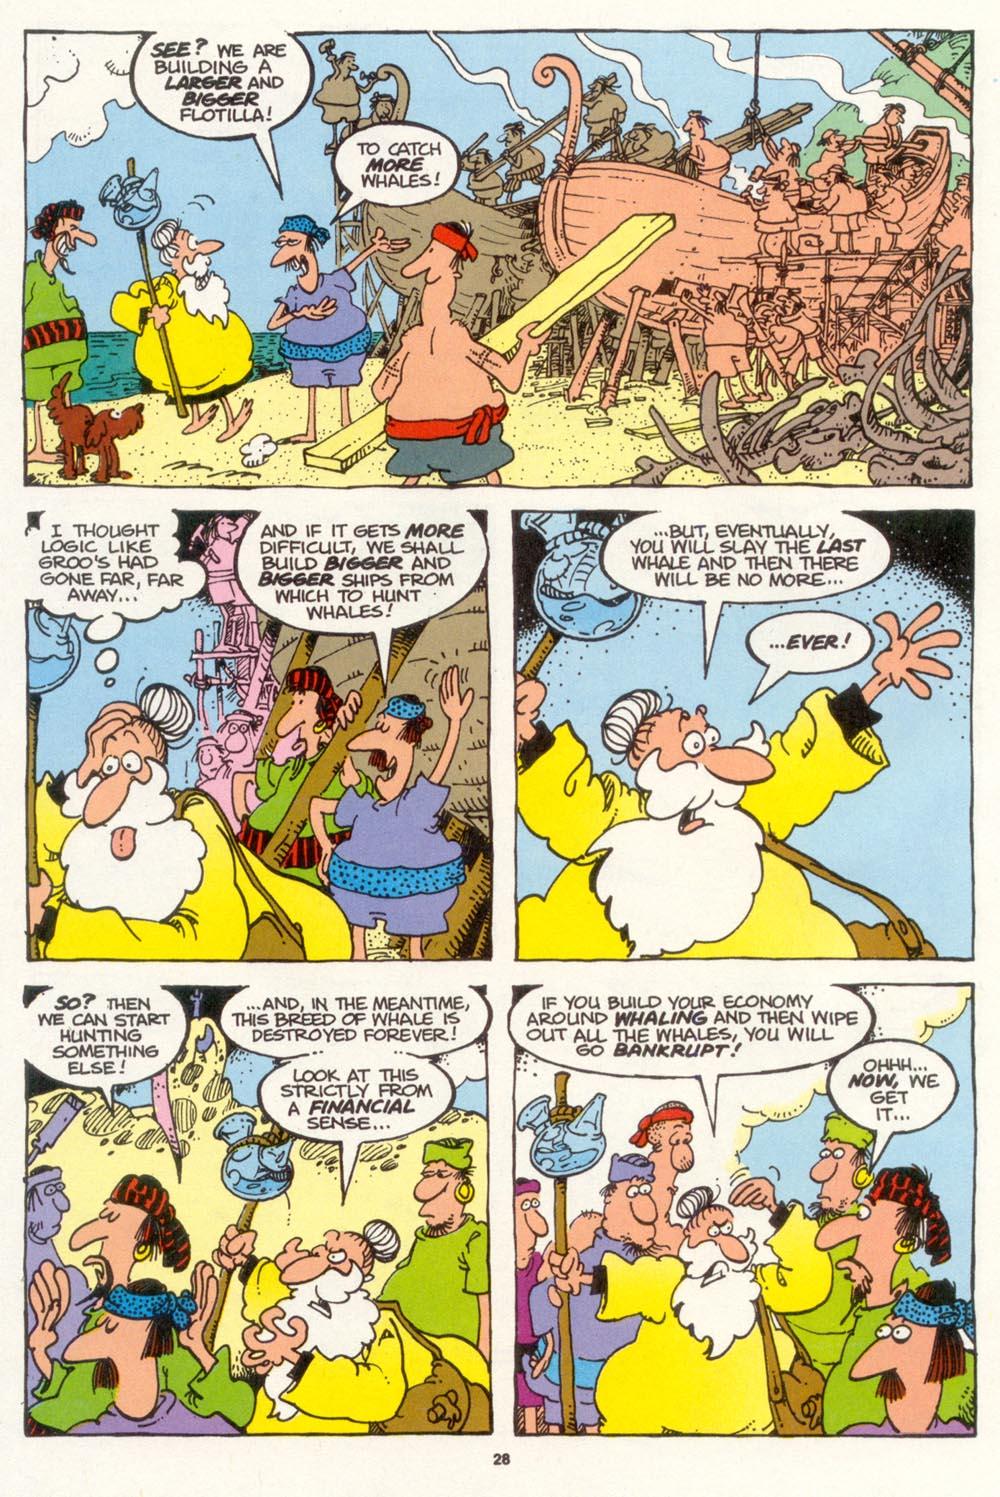 Read online Sergio Aragonés Groo the Wanderer comic -  Issue #103 - 30